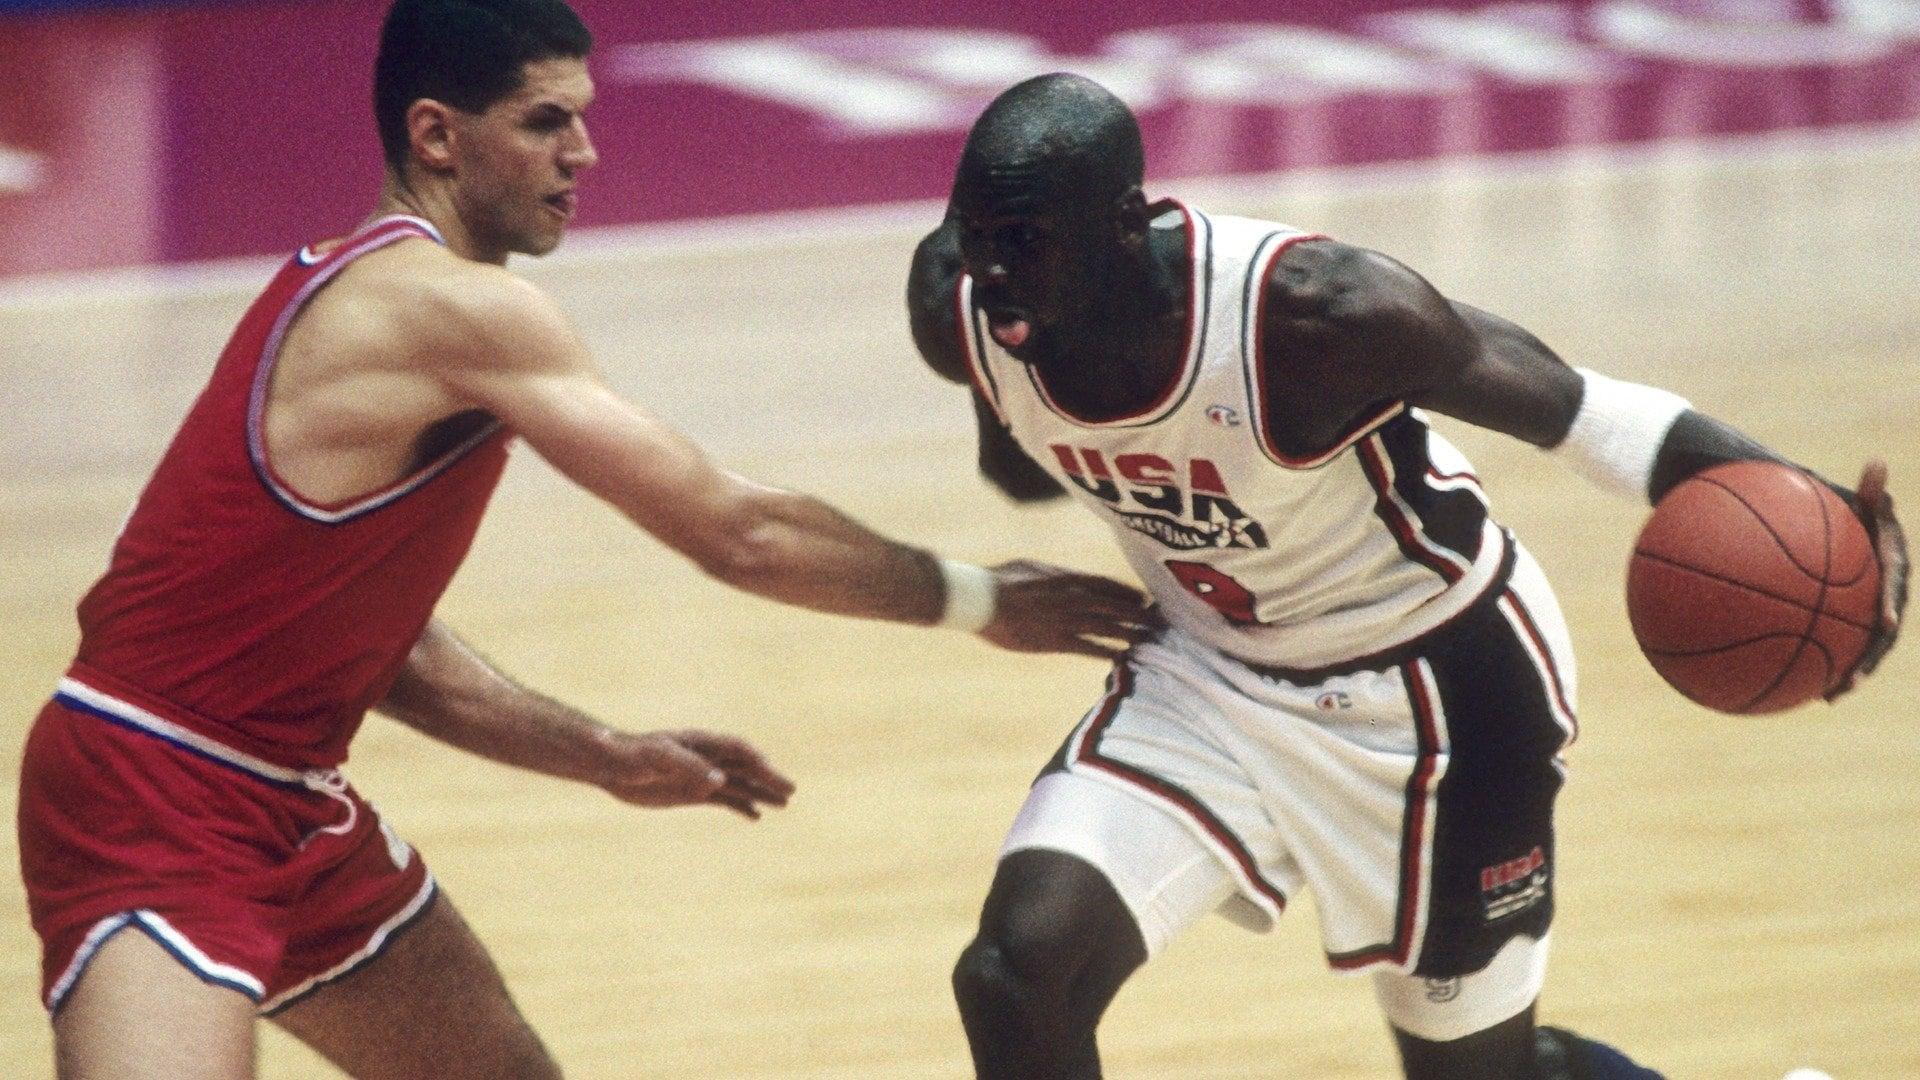 Men's Basketball Final (Barcelona 1992)